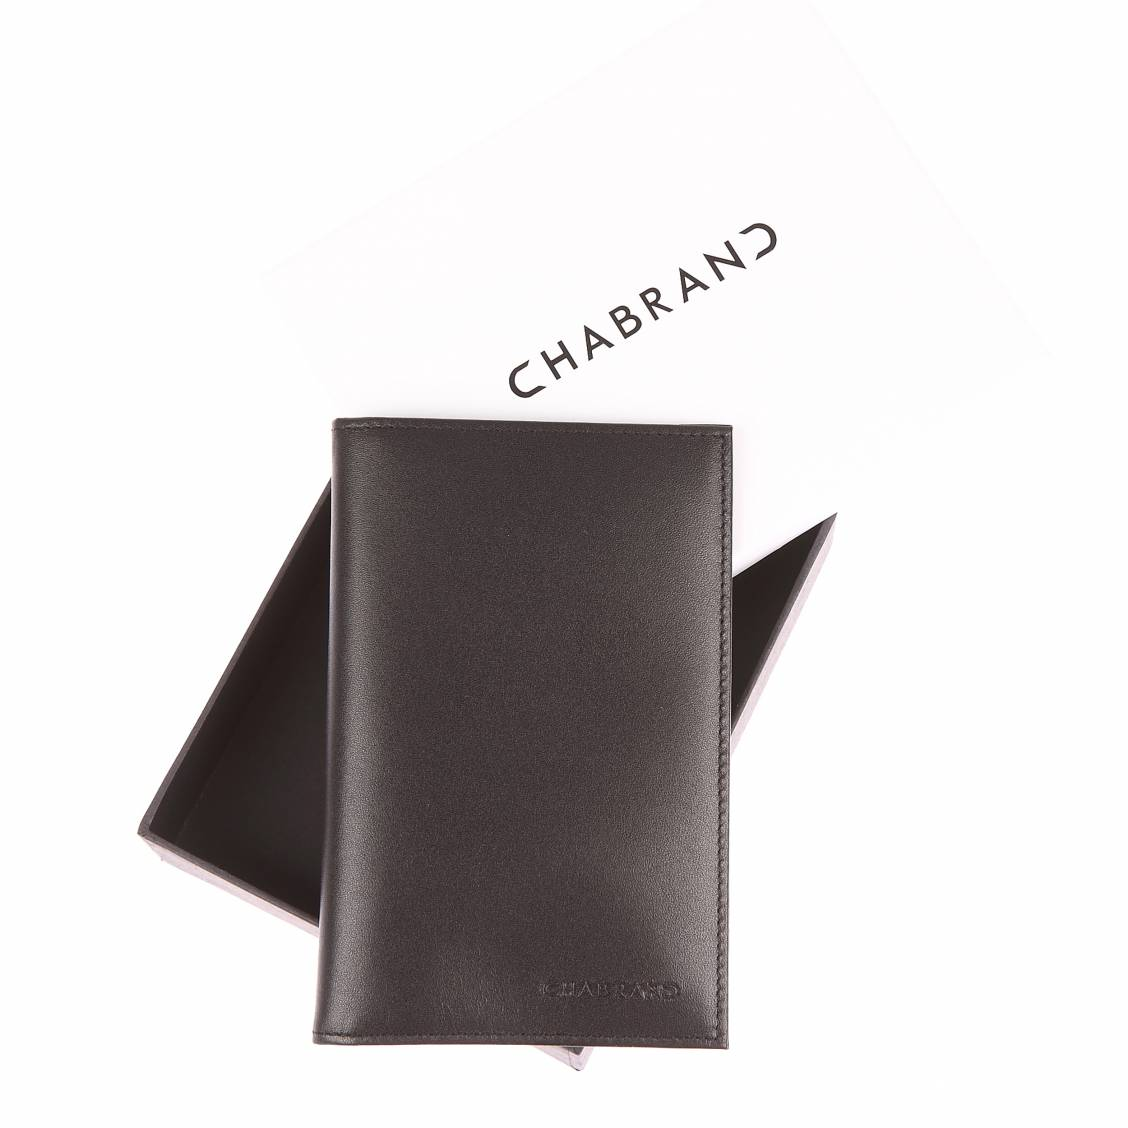 Porte-papiers Chabrand en cuir noir vu6YO